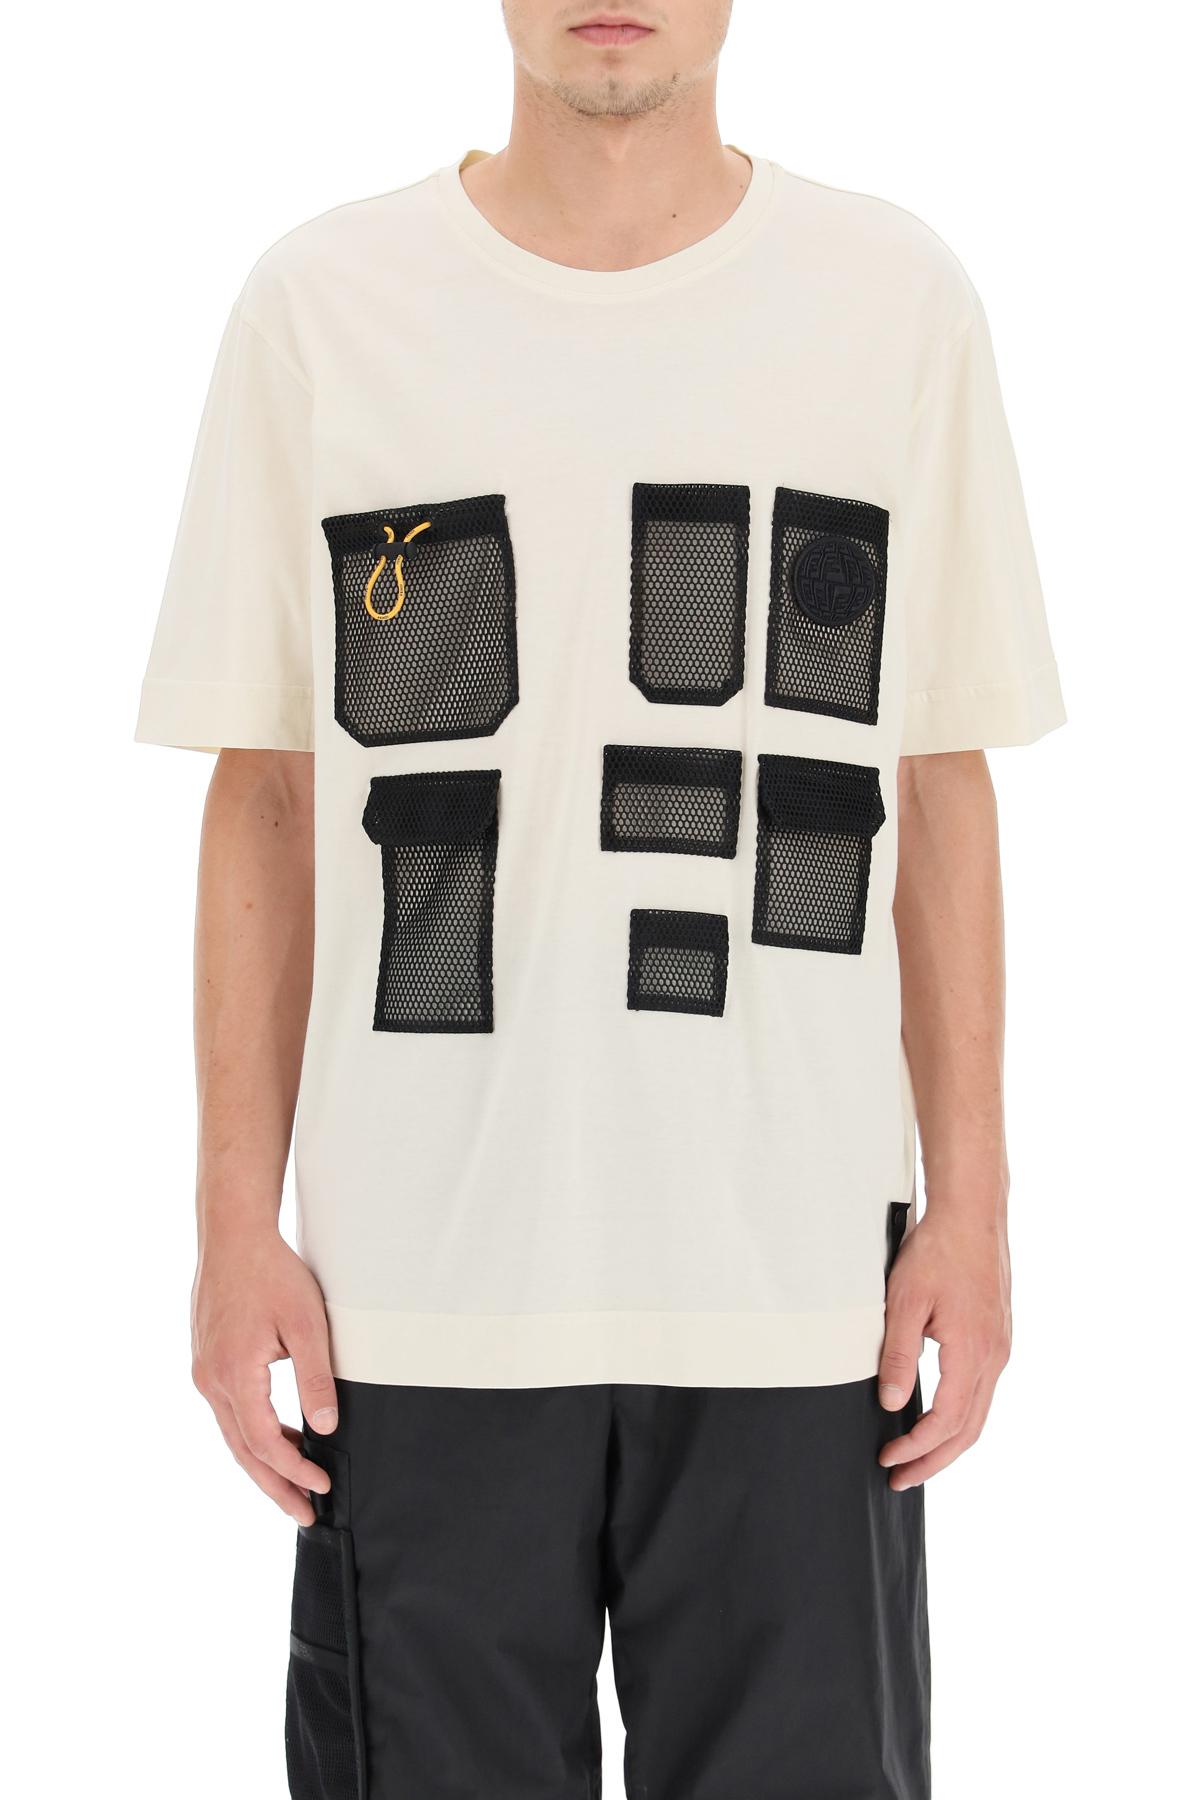 Fendi t-shirt multi pocket in mesh